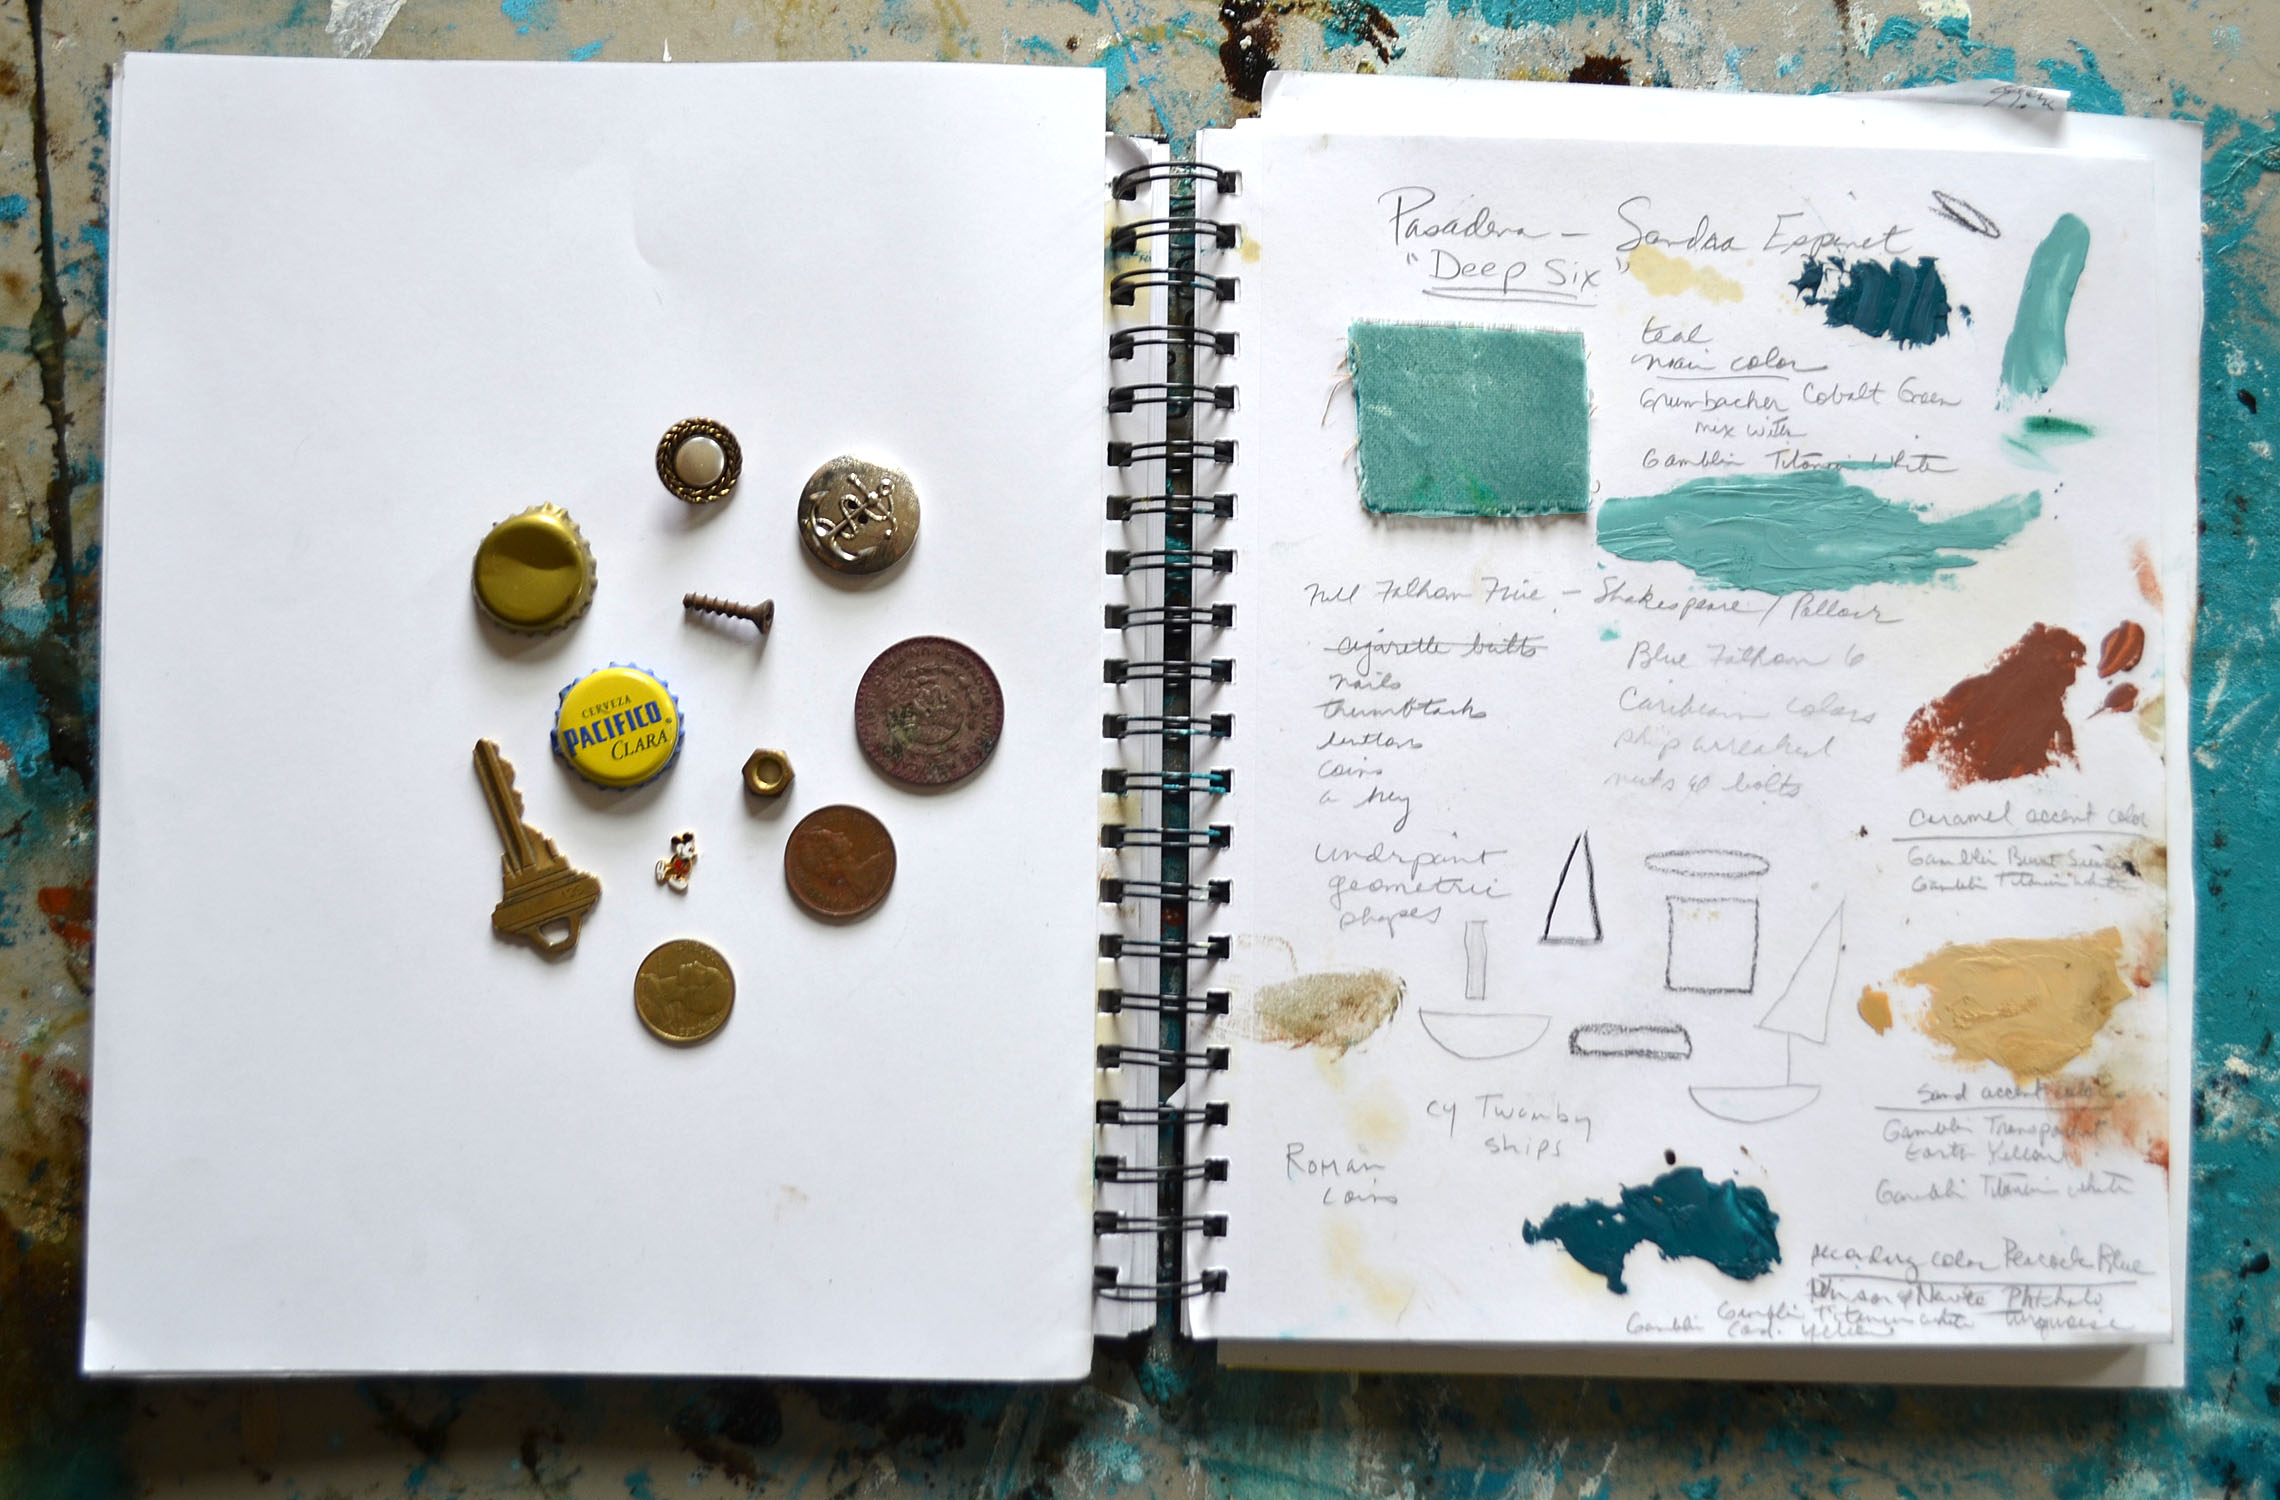 Sketchbook designs for SE Design Services Pasedena project created by Velvet Marshall.  copyright © 2014 Velvet Marshall all rights reserved